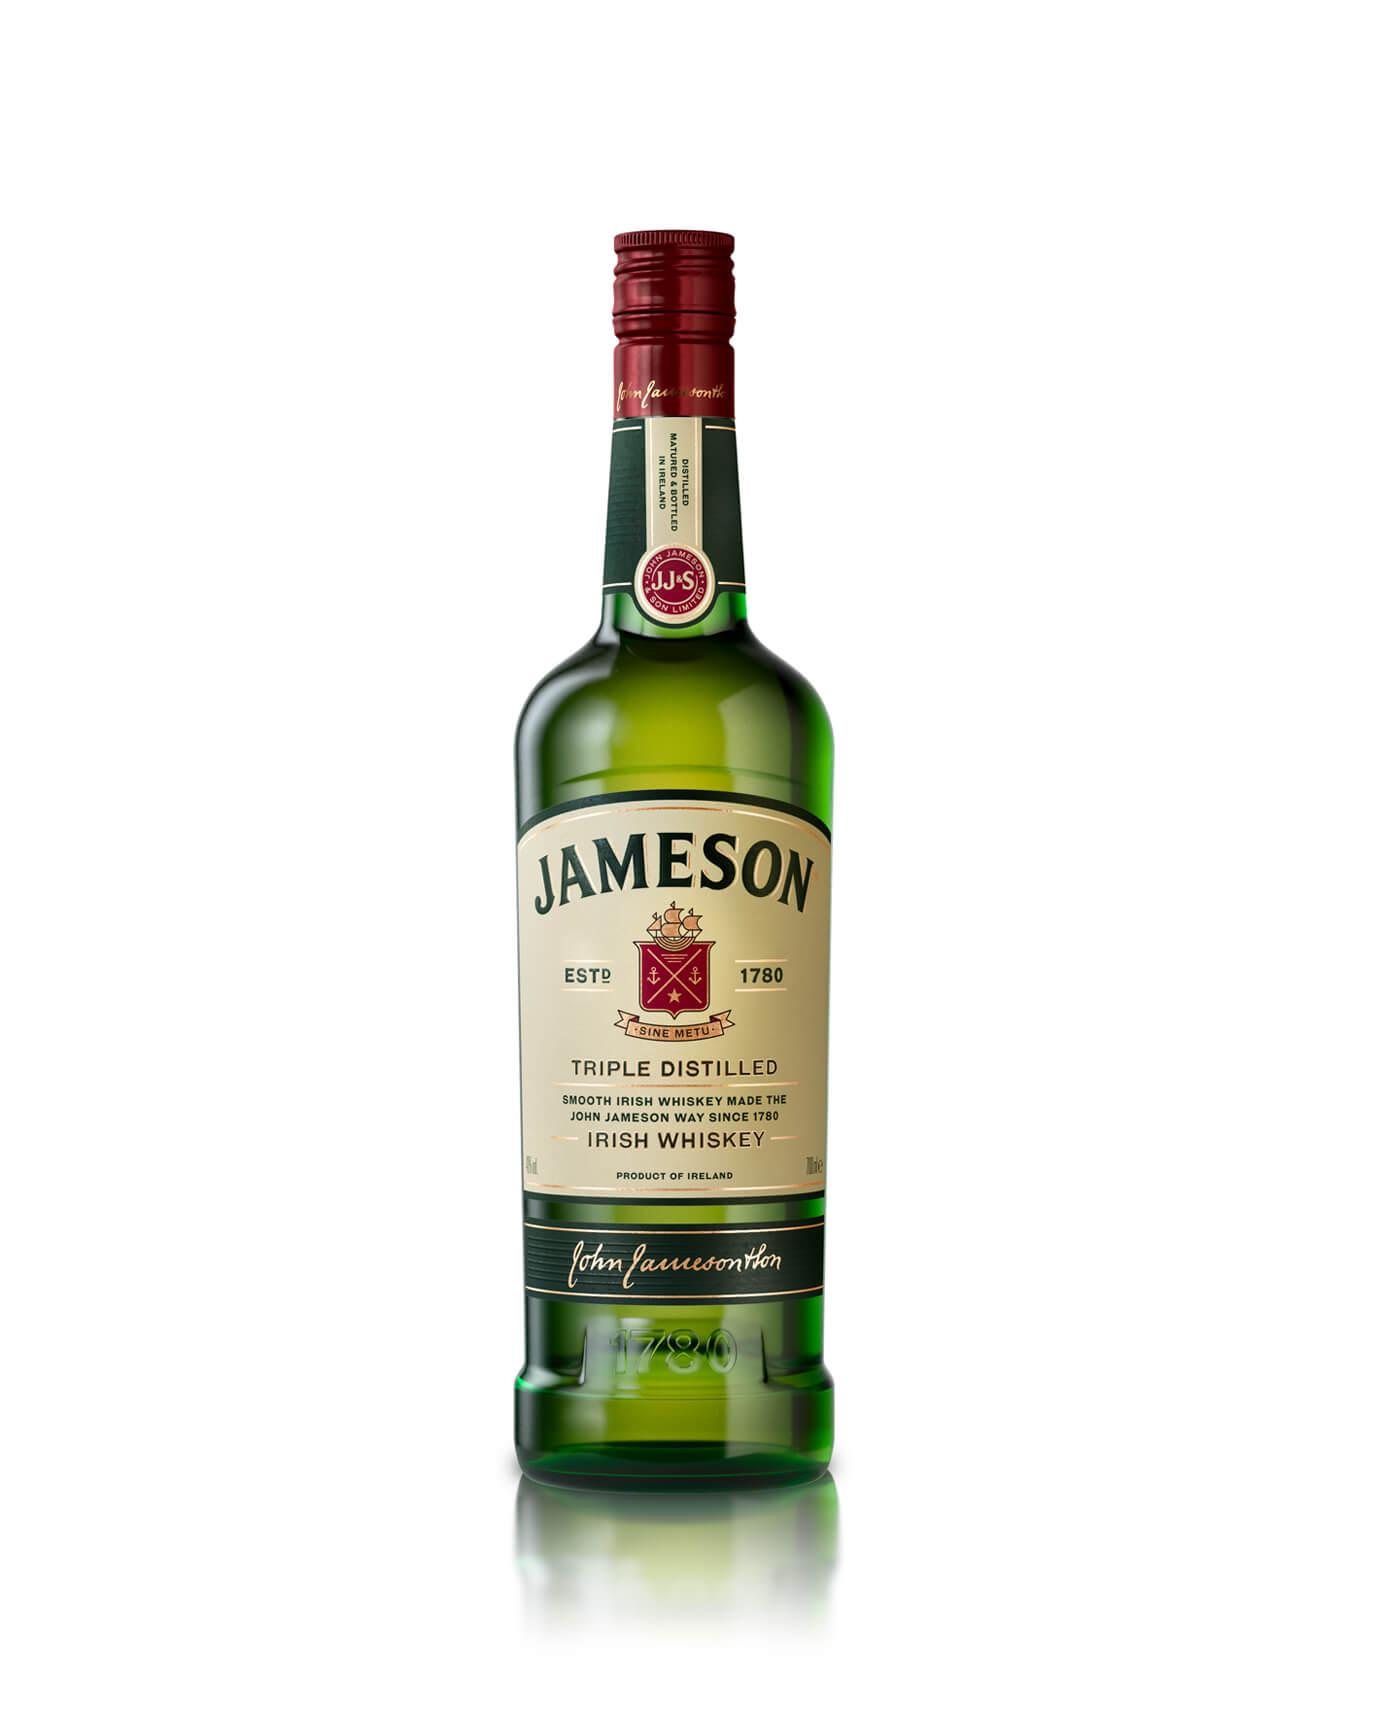 JAMESON×グッドモーニングアメリカ|金廣真悟が語る、お酒と音楽の関係性と<JAMESON HALLOWEEN FES 2>に向けて interview_jameson_product_700ml